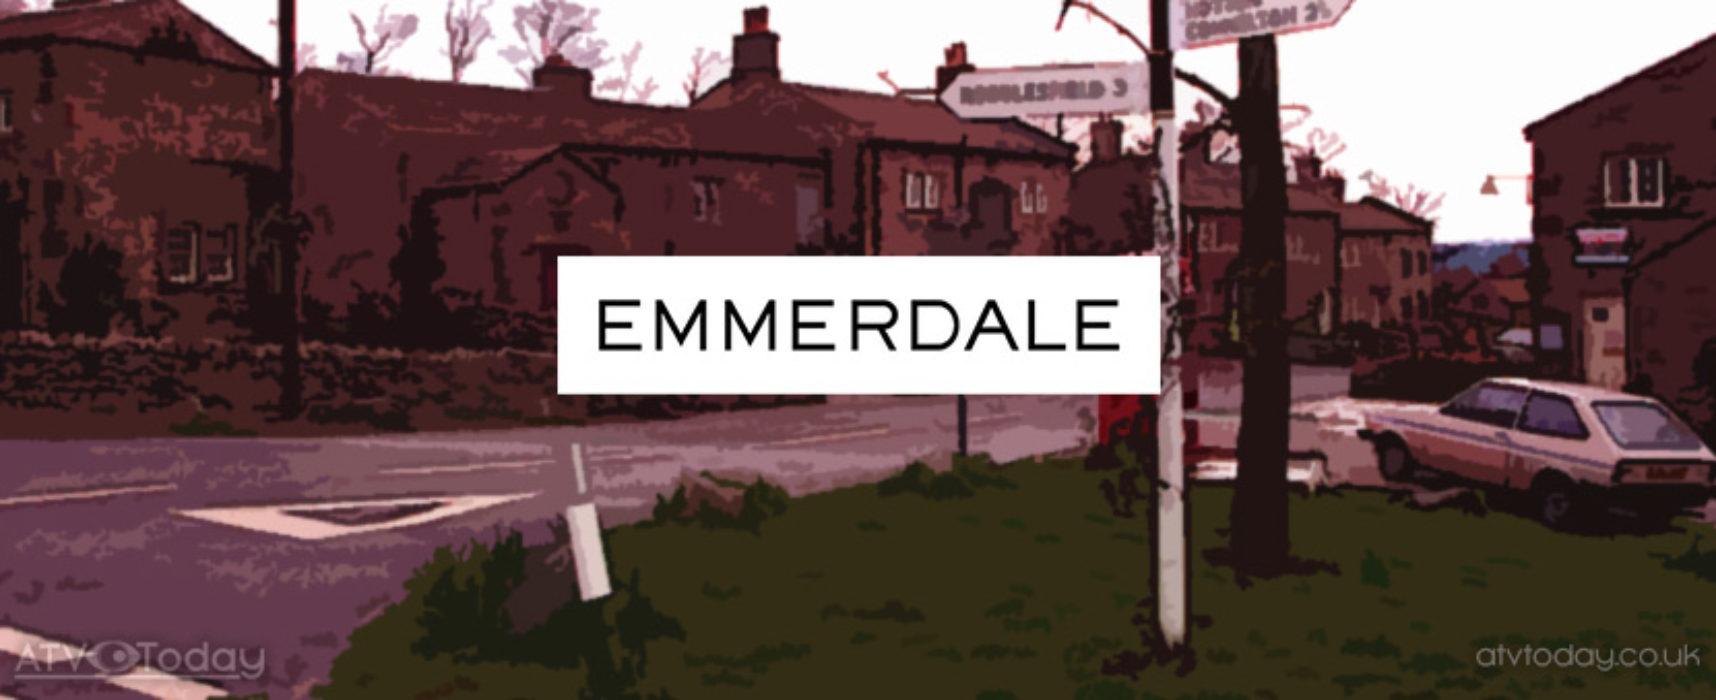 Old Bill meets Emmerdale